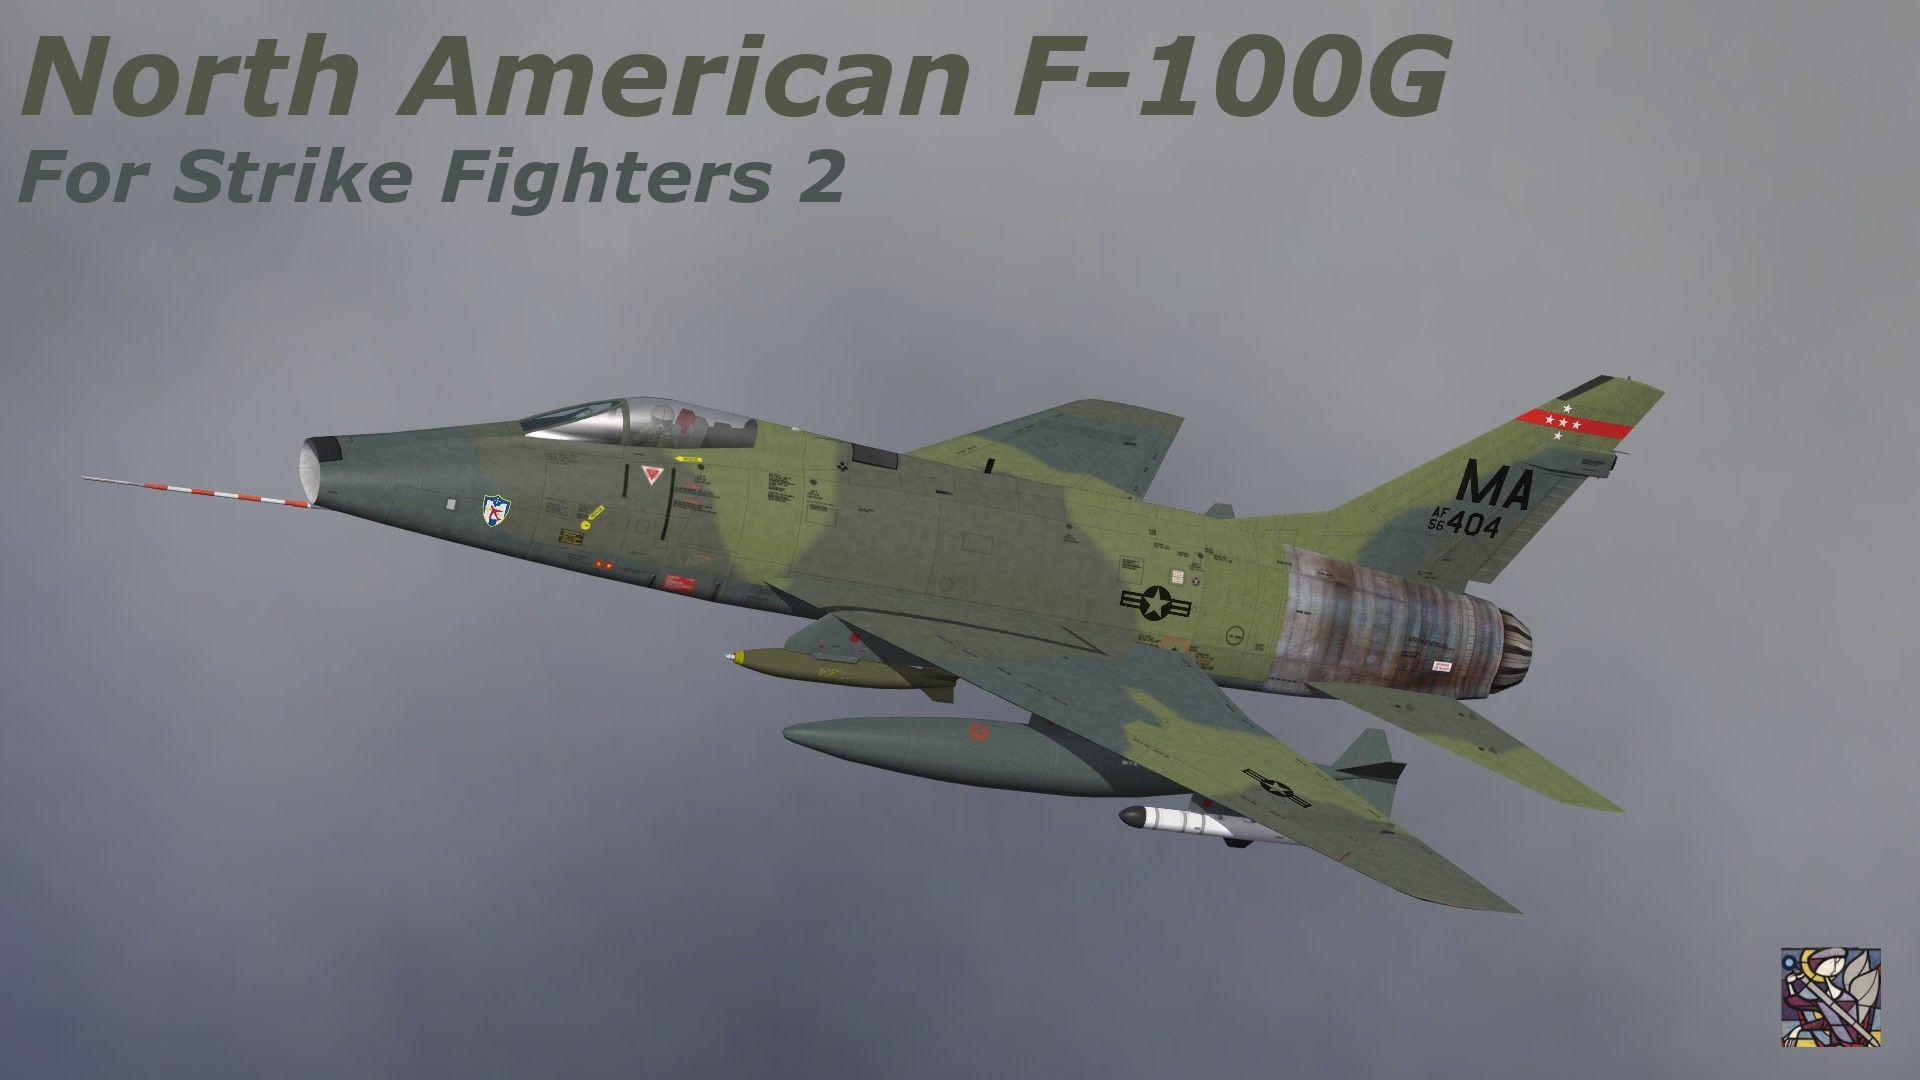 USAFF-100GSUPERSABRE08.jpg